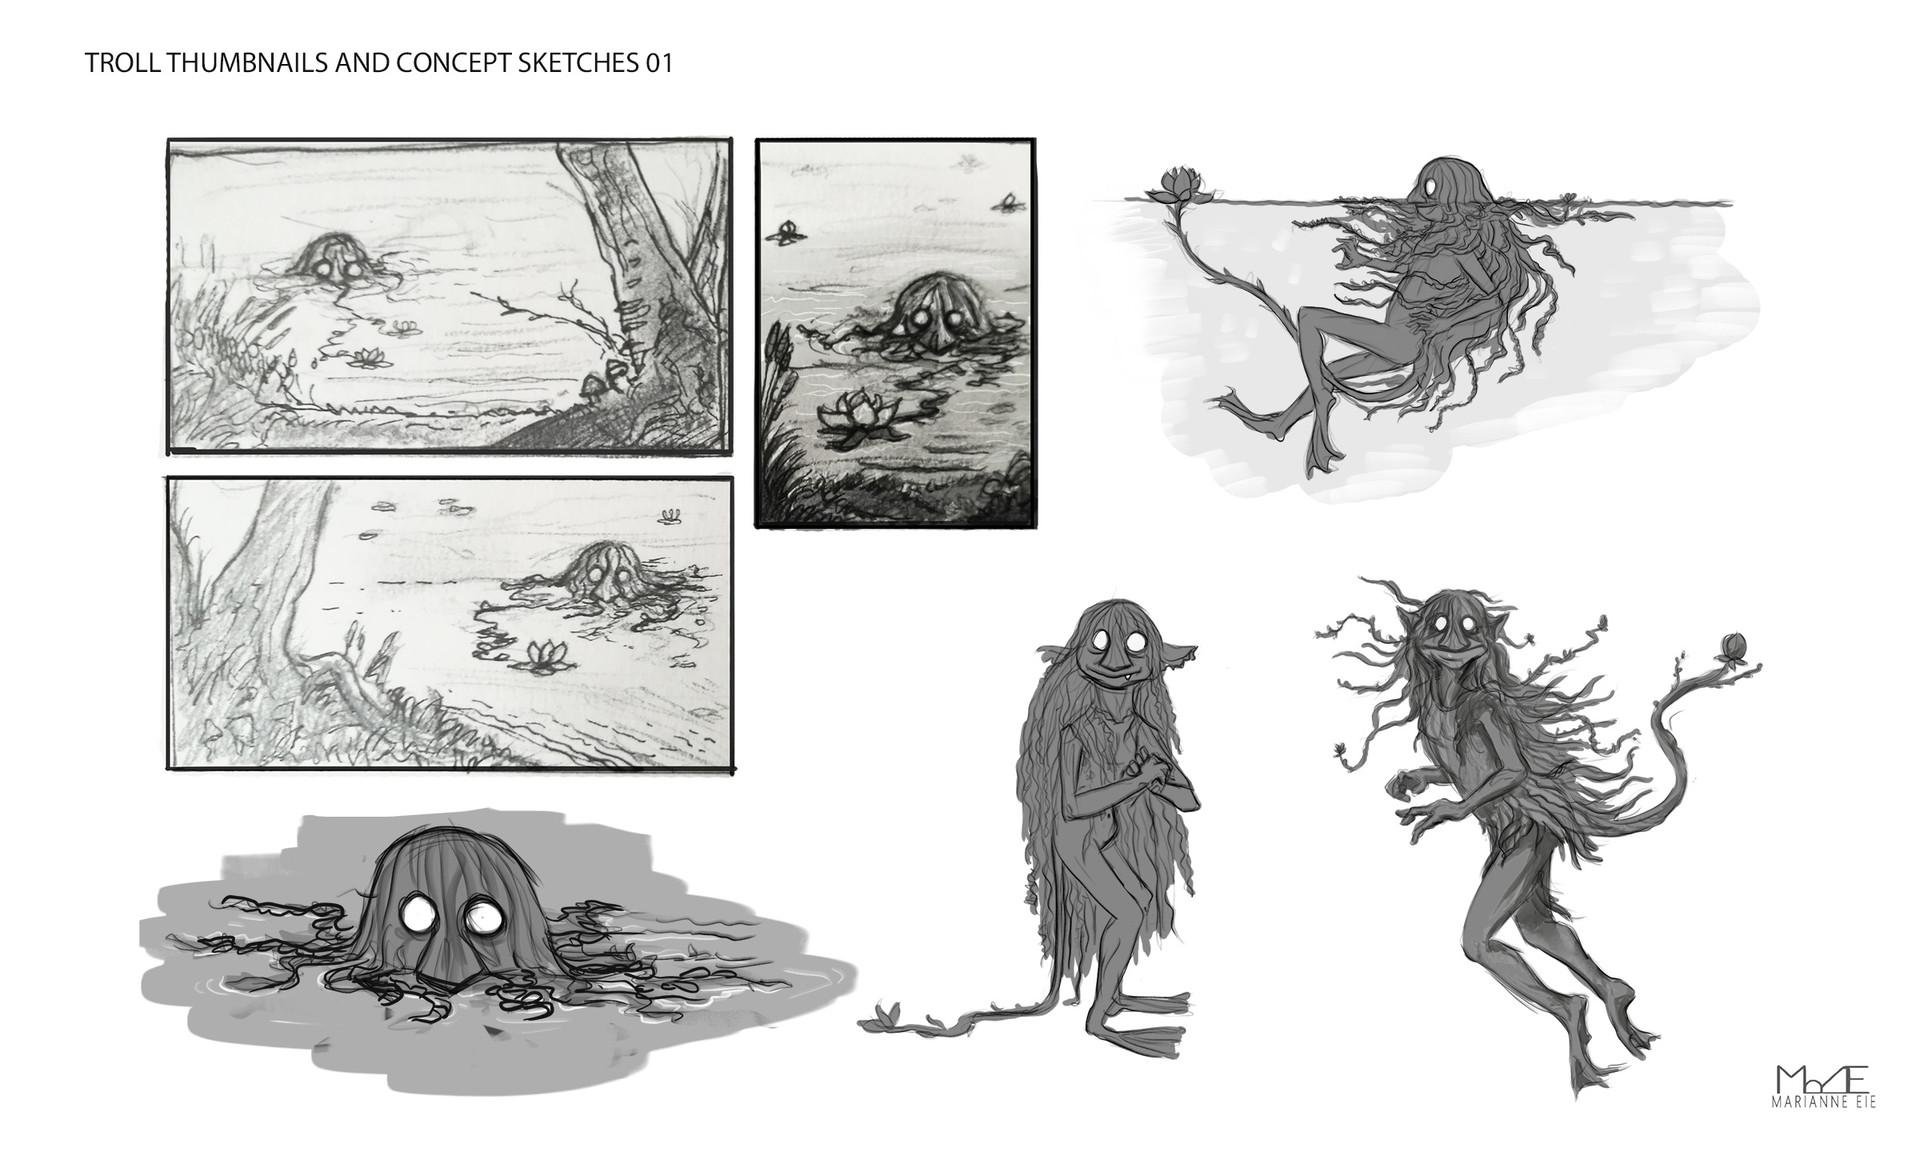 Marianne eie trolls sketches 01